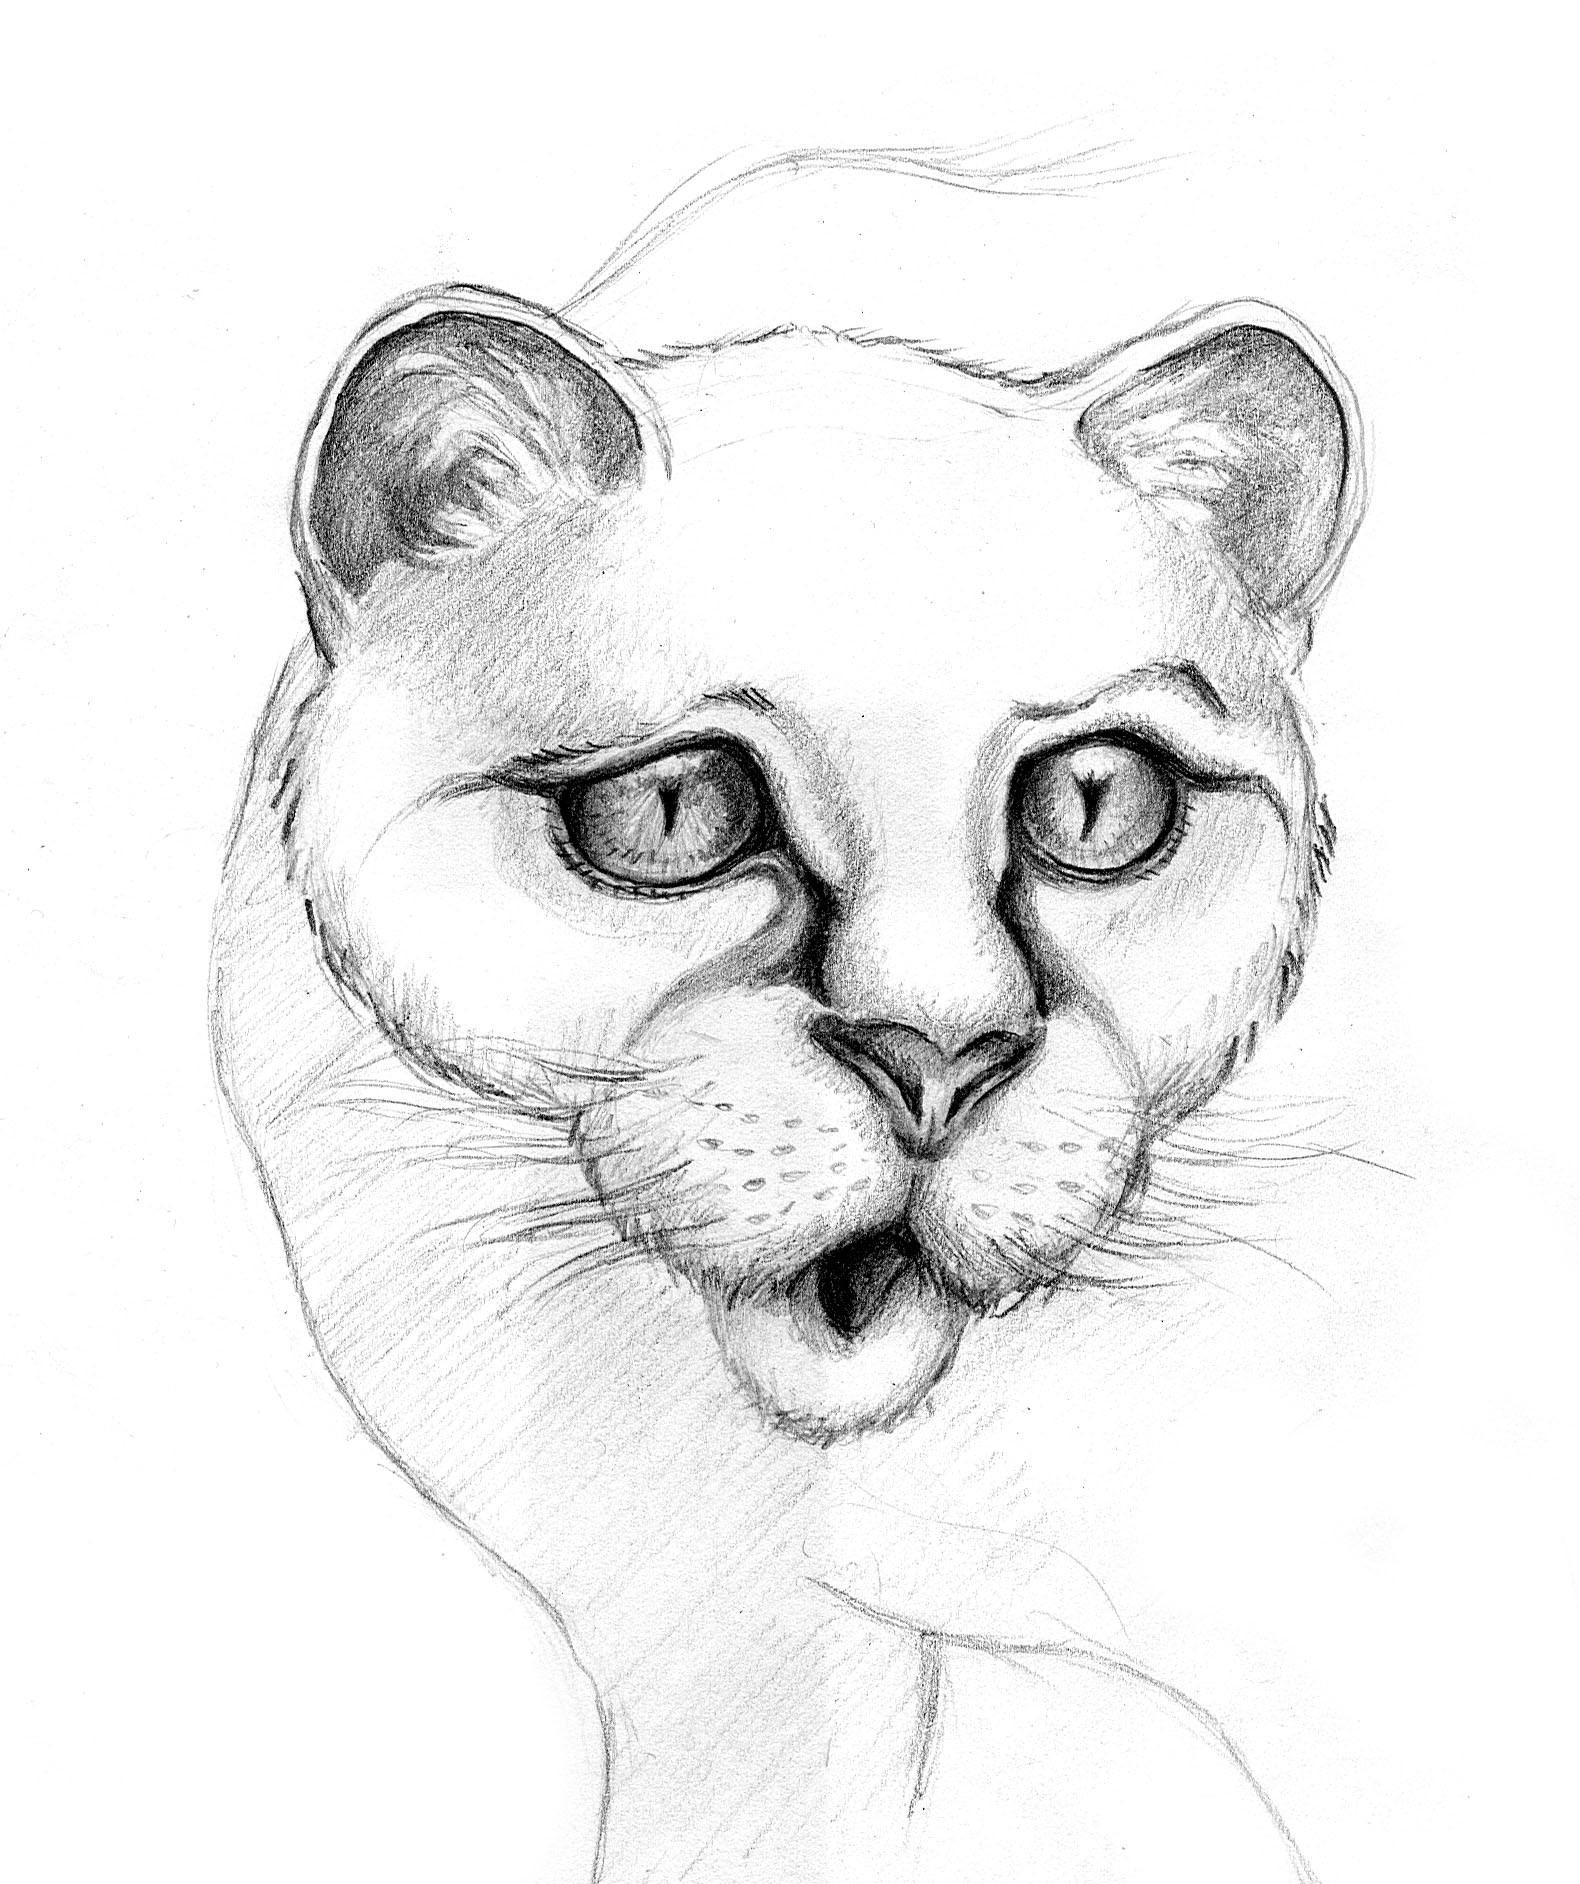 Patricia vasquez de velasco animales bocetos 03a